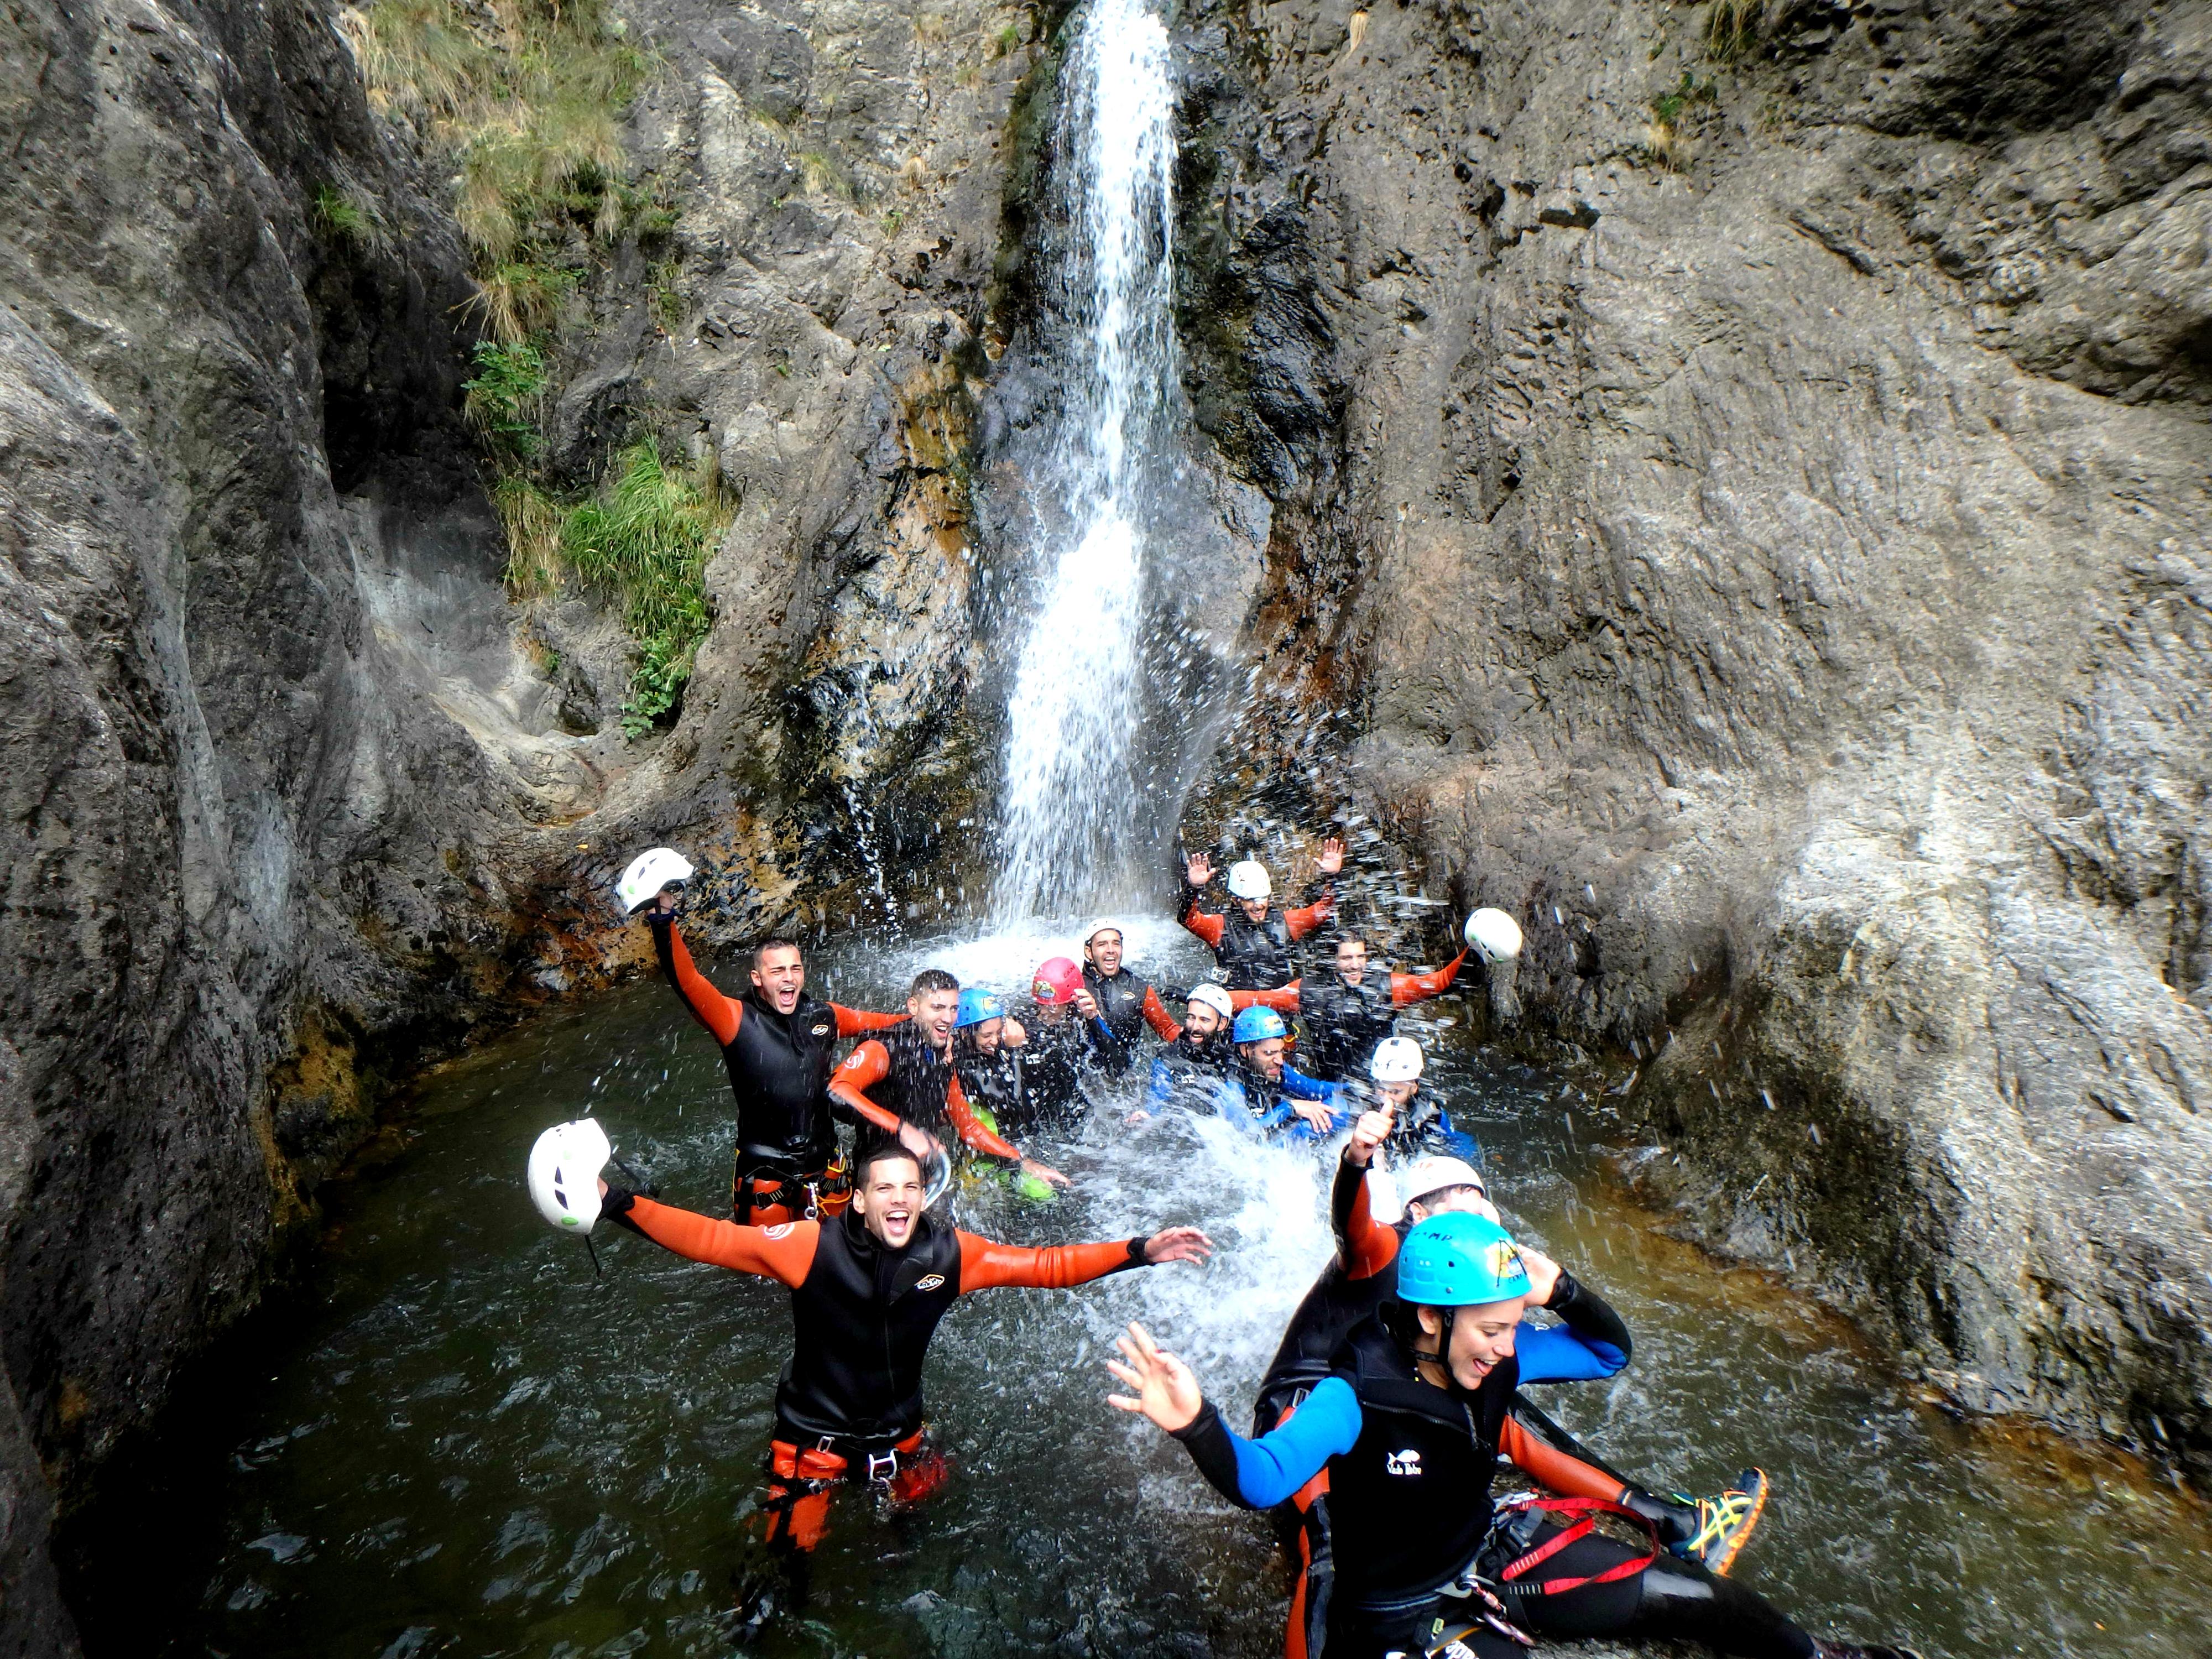 Gorges de Nuria